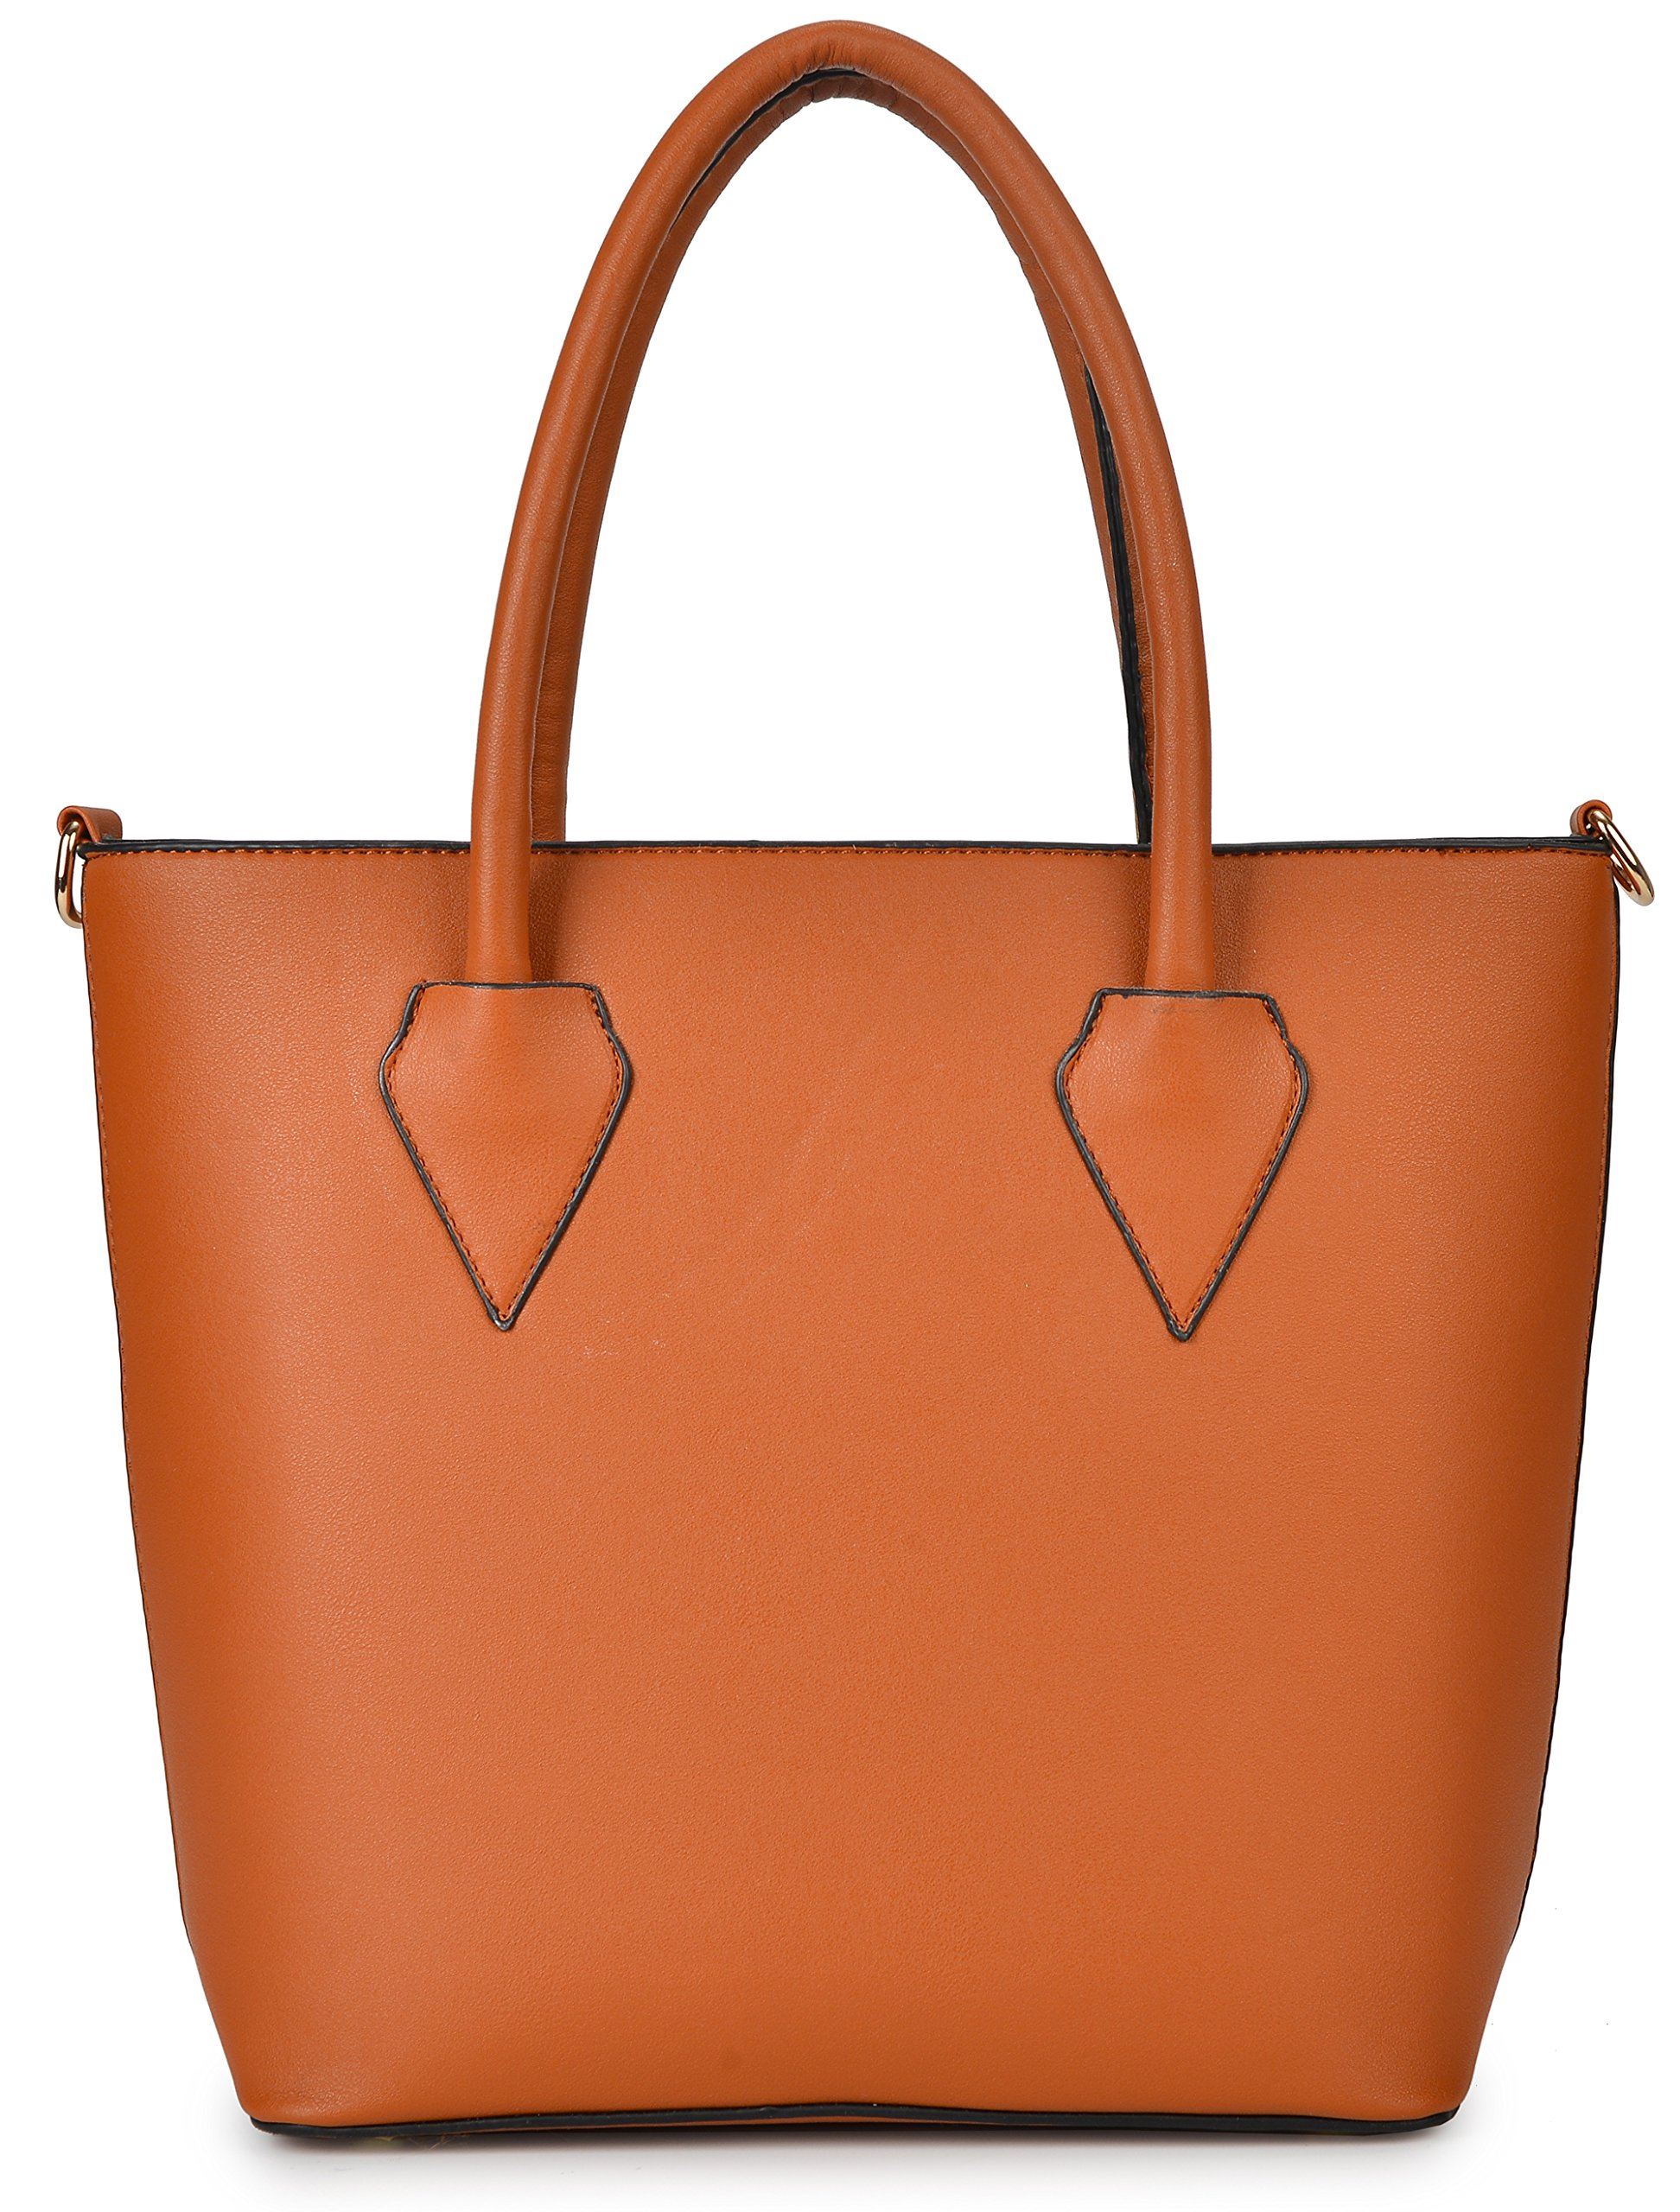 Women Handbag Purse Hobo Faux Leather Messenger Bag Clutch Satchel Bag 3 Piece Gift Set by KasPala (Image #4)